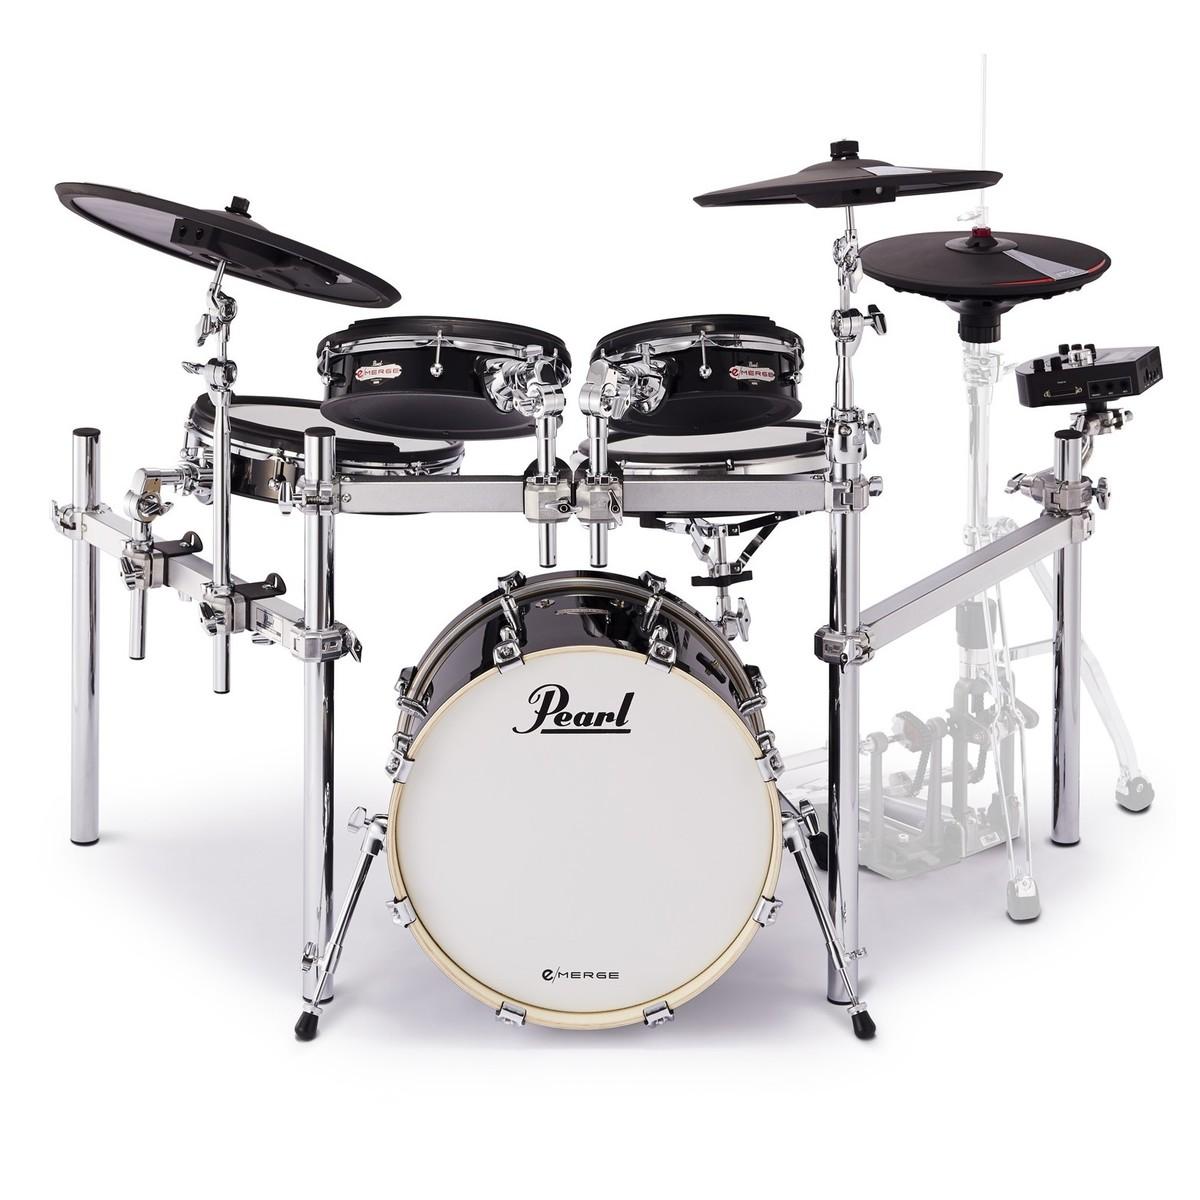 Pearl E Merge Hybrid Electronic Drum Kit Powered By Korg